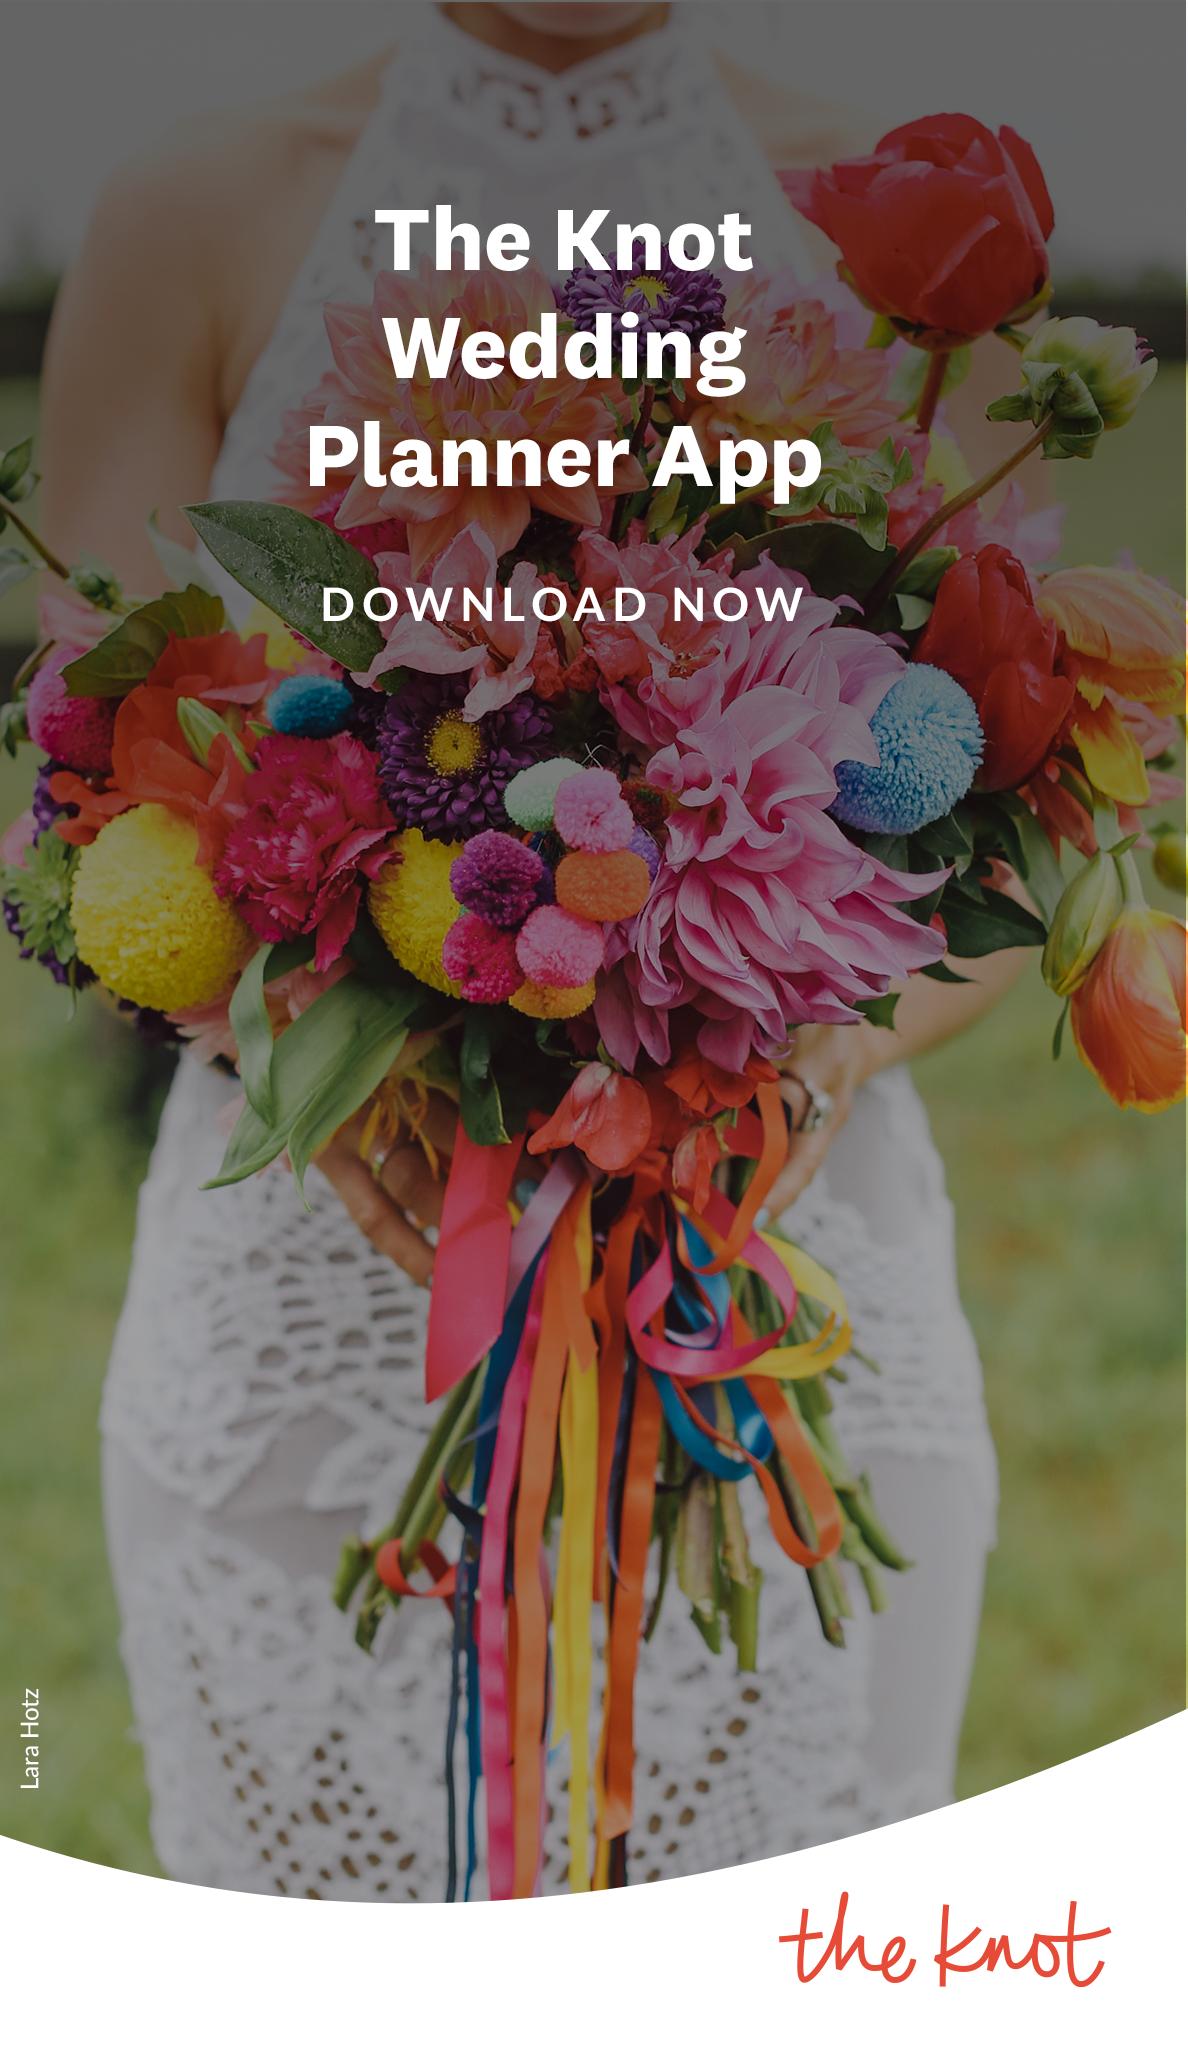 The Knot Wedding Planner App in 2020 Wedding planner app